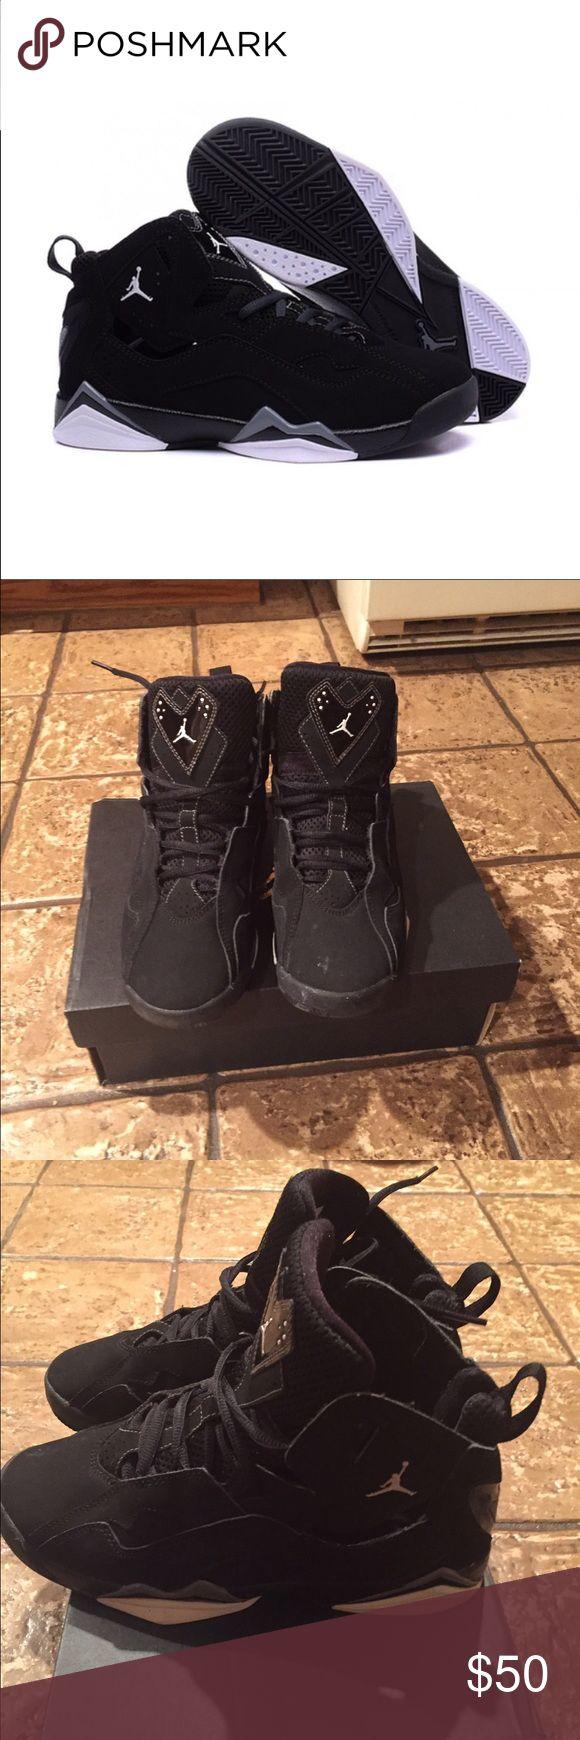 True Flight Jordan's size 4.5Y fits size 6 womens Gently used Jordans bought on poshmark but too small for me. Size 4.5 Y/ fits a size 6 in women's Jordan Shoes Sneakers